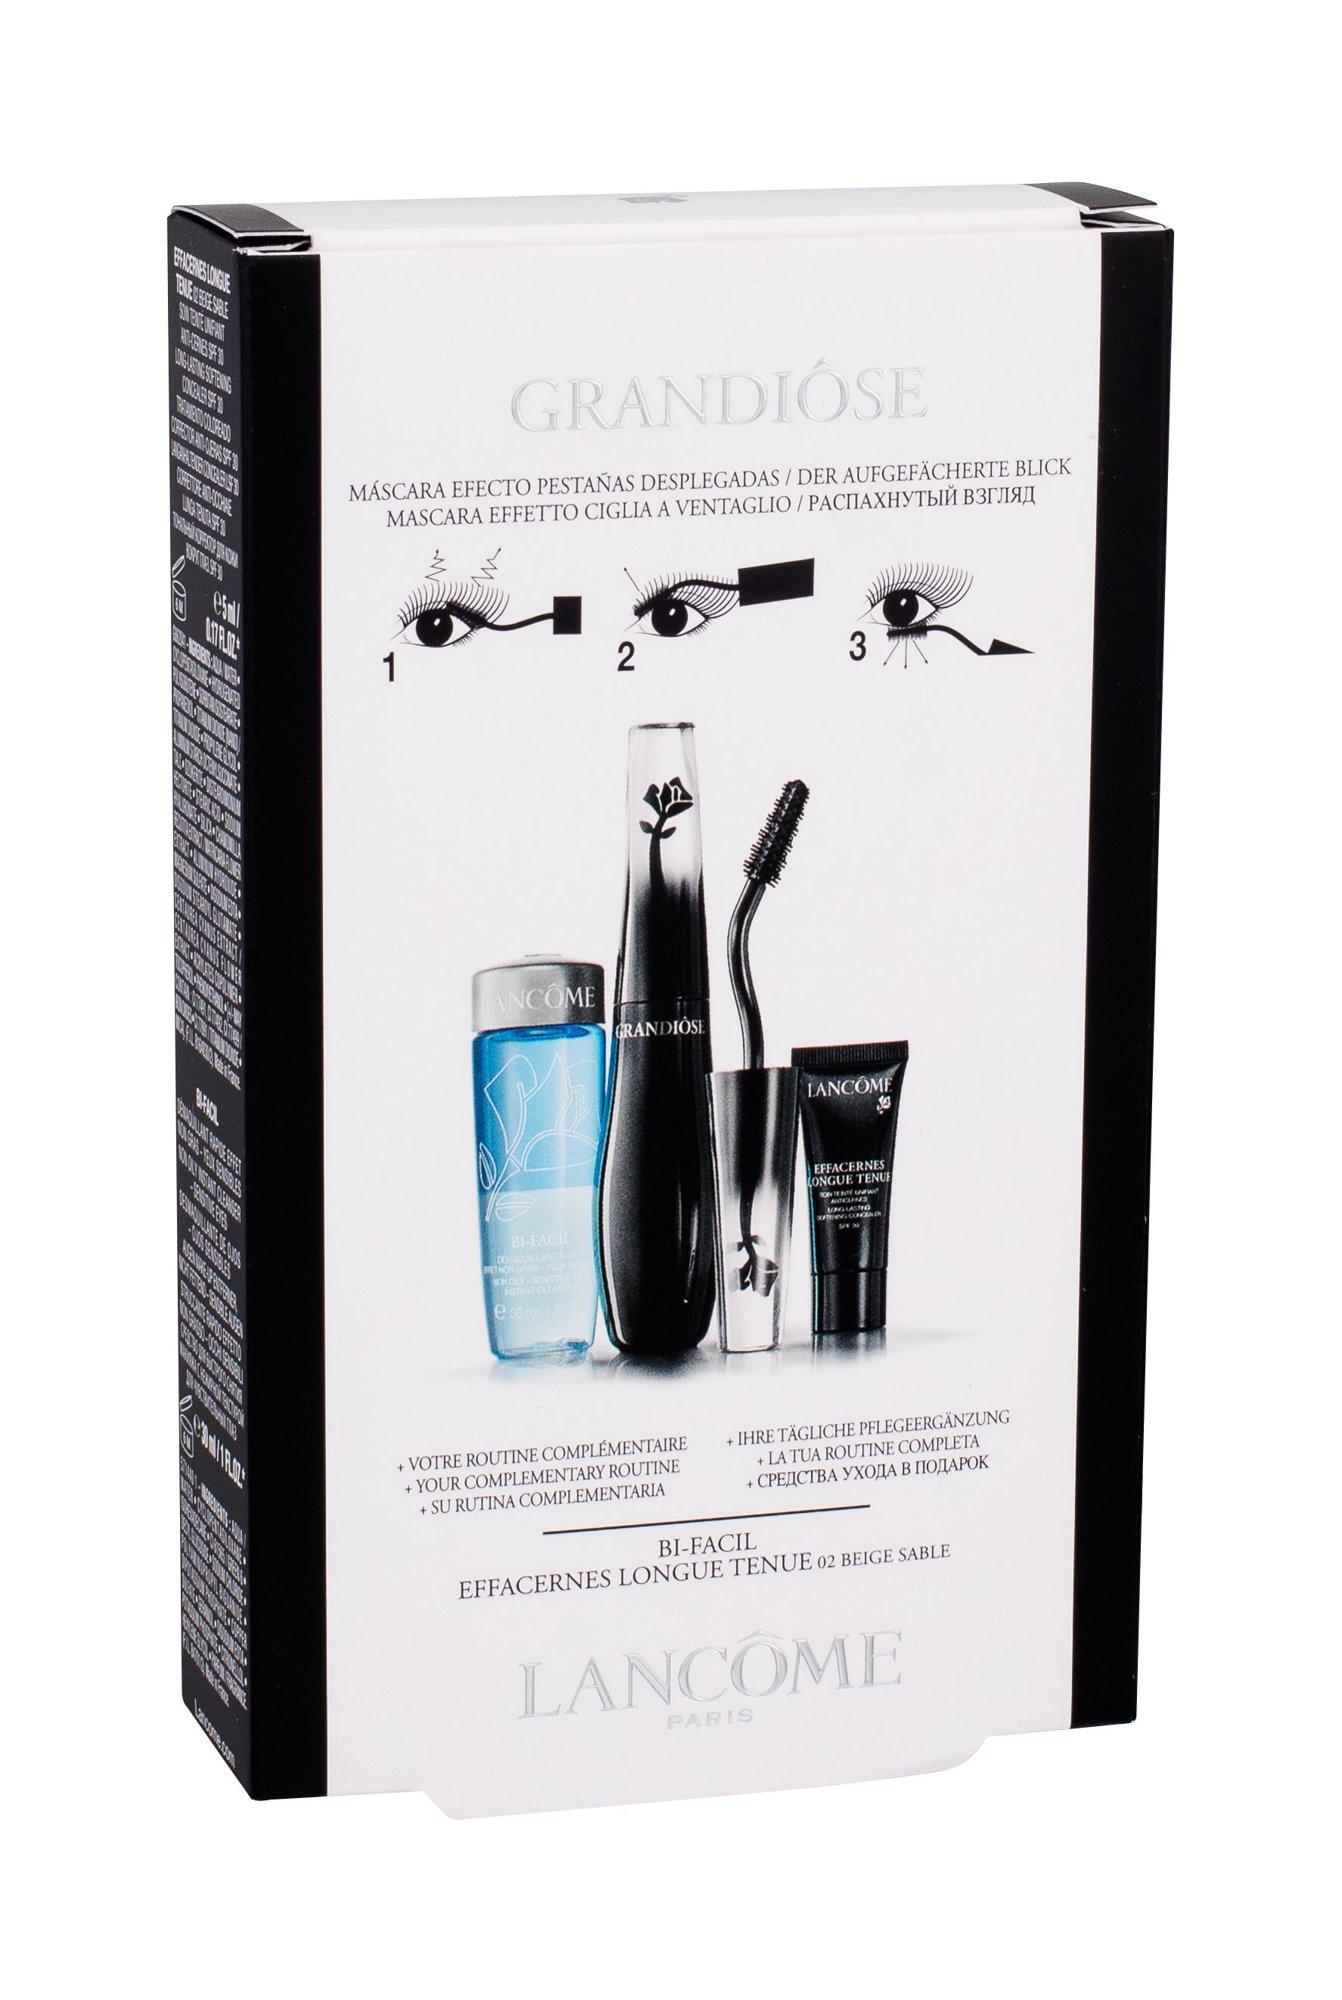 Lancôme Grandiose Mascara 10ml 01 Noir Mirifique